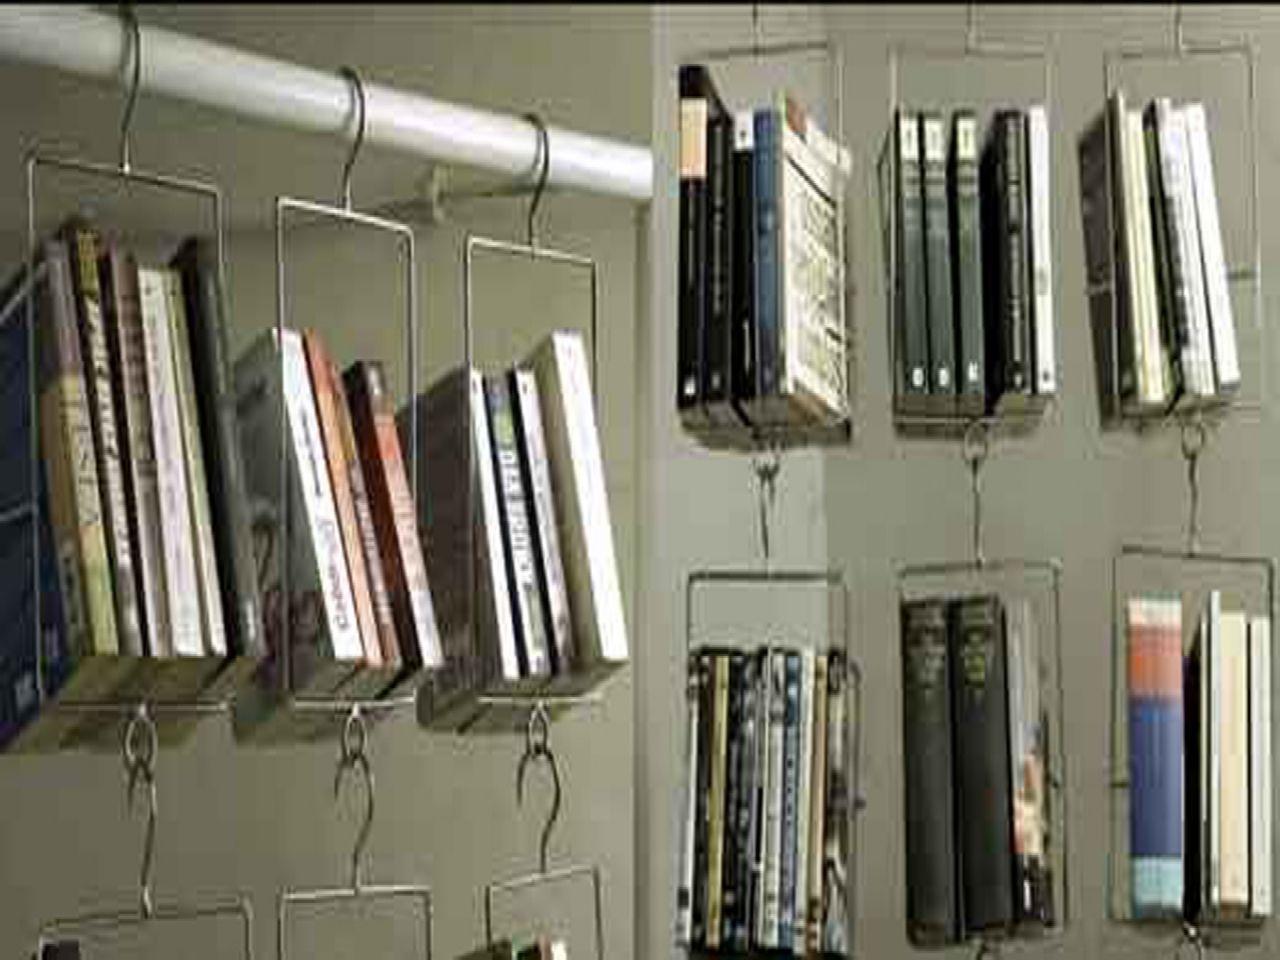 suspended-storage-shelves-hanging-book-storage-e44a0b7837b09912.jpg (1280×960)